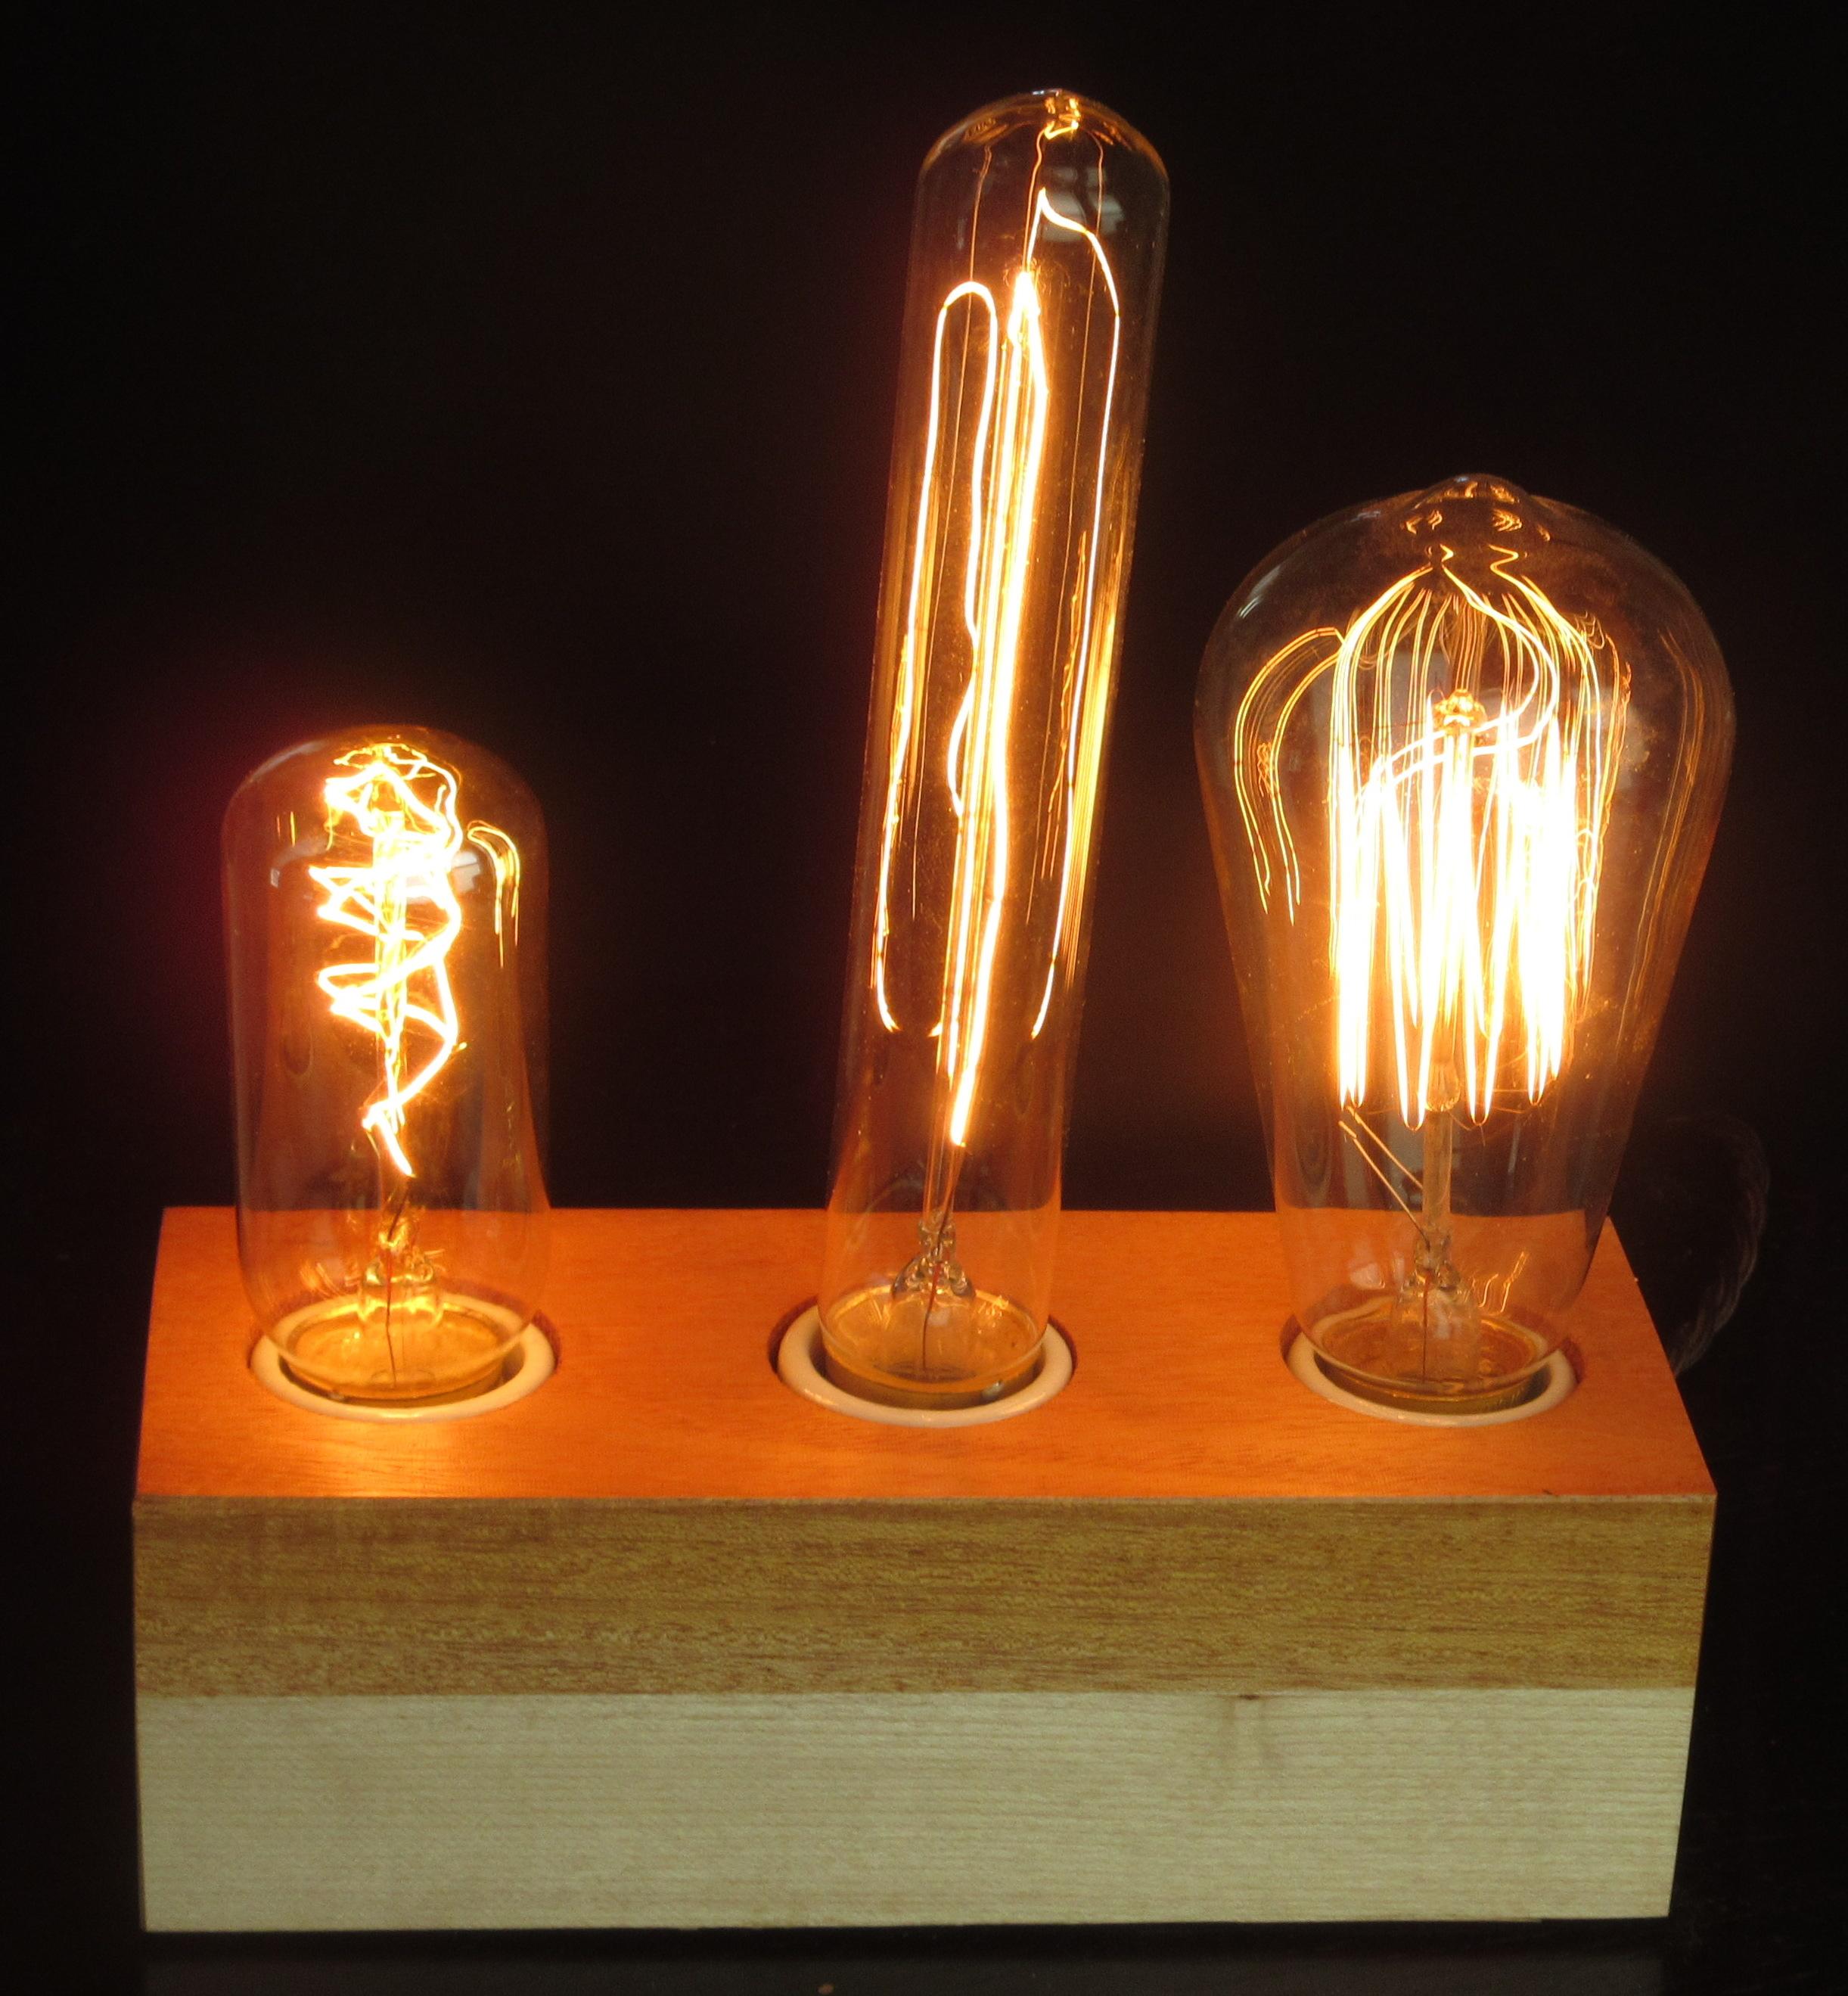 Mahogany and Maple - 3 lamps